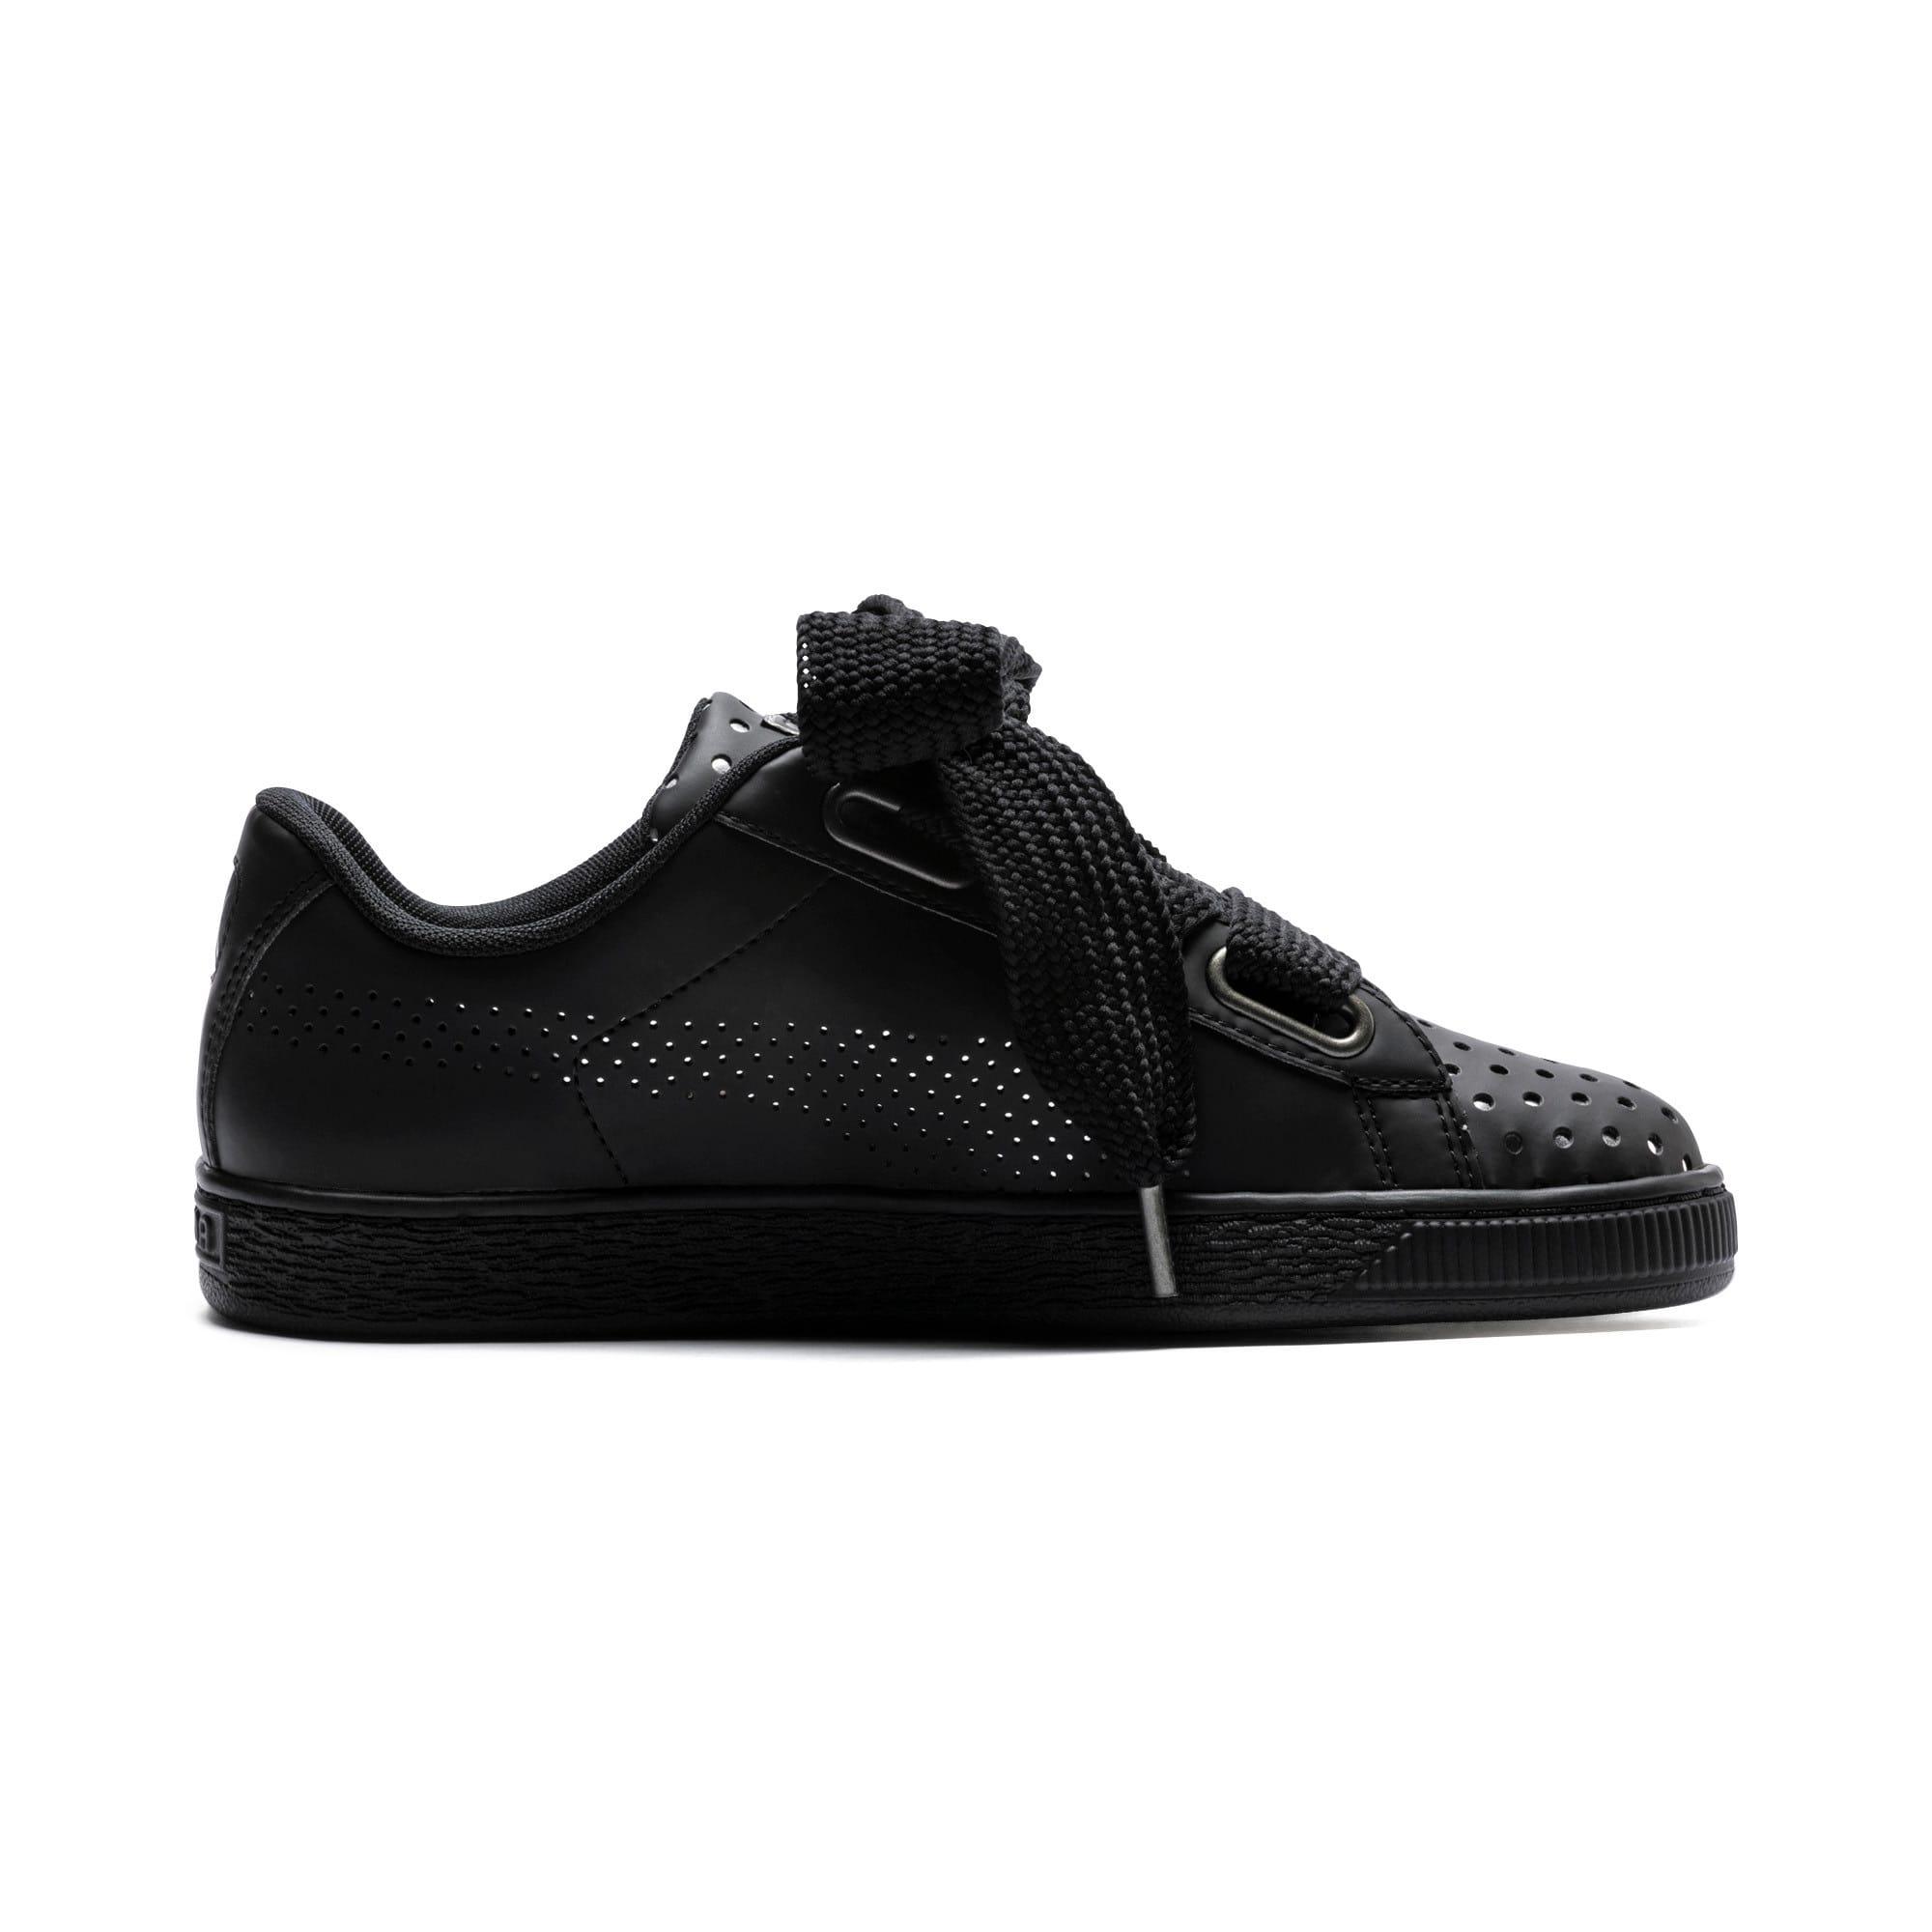 Thumbnail 5 of Basket Heart Lux Women's Sneakers, Puma Black-Puma Black, medium